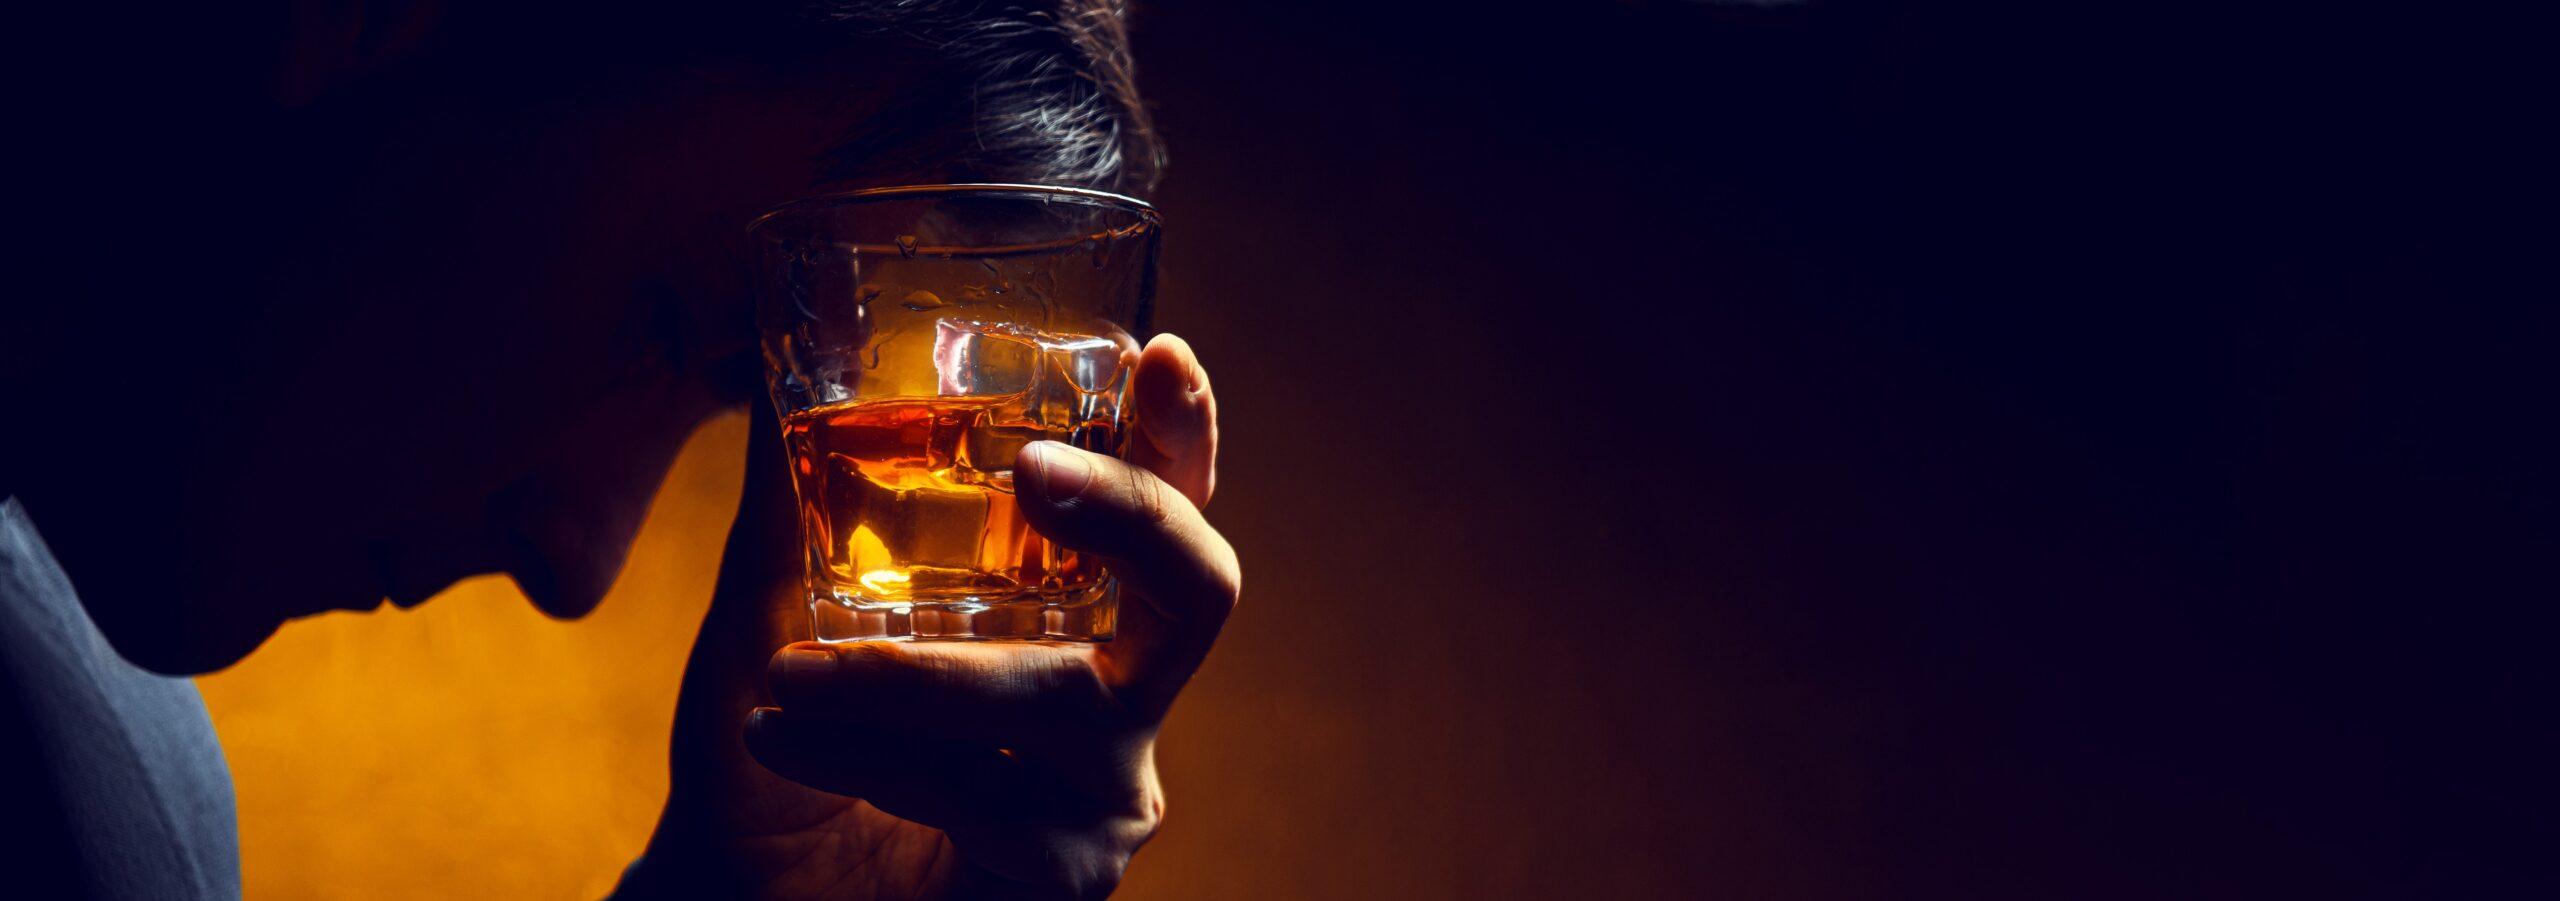 zatekanje-k-alkoholu-portal8-si